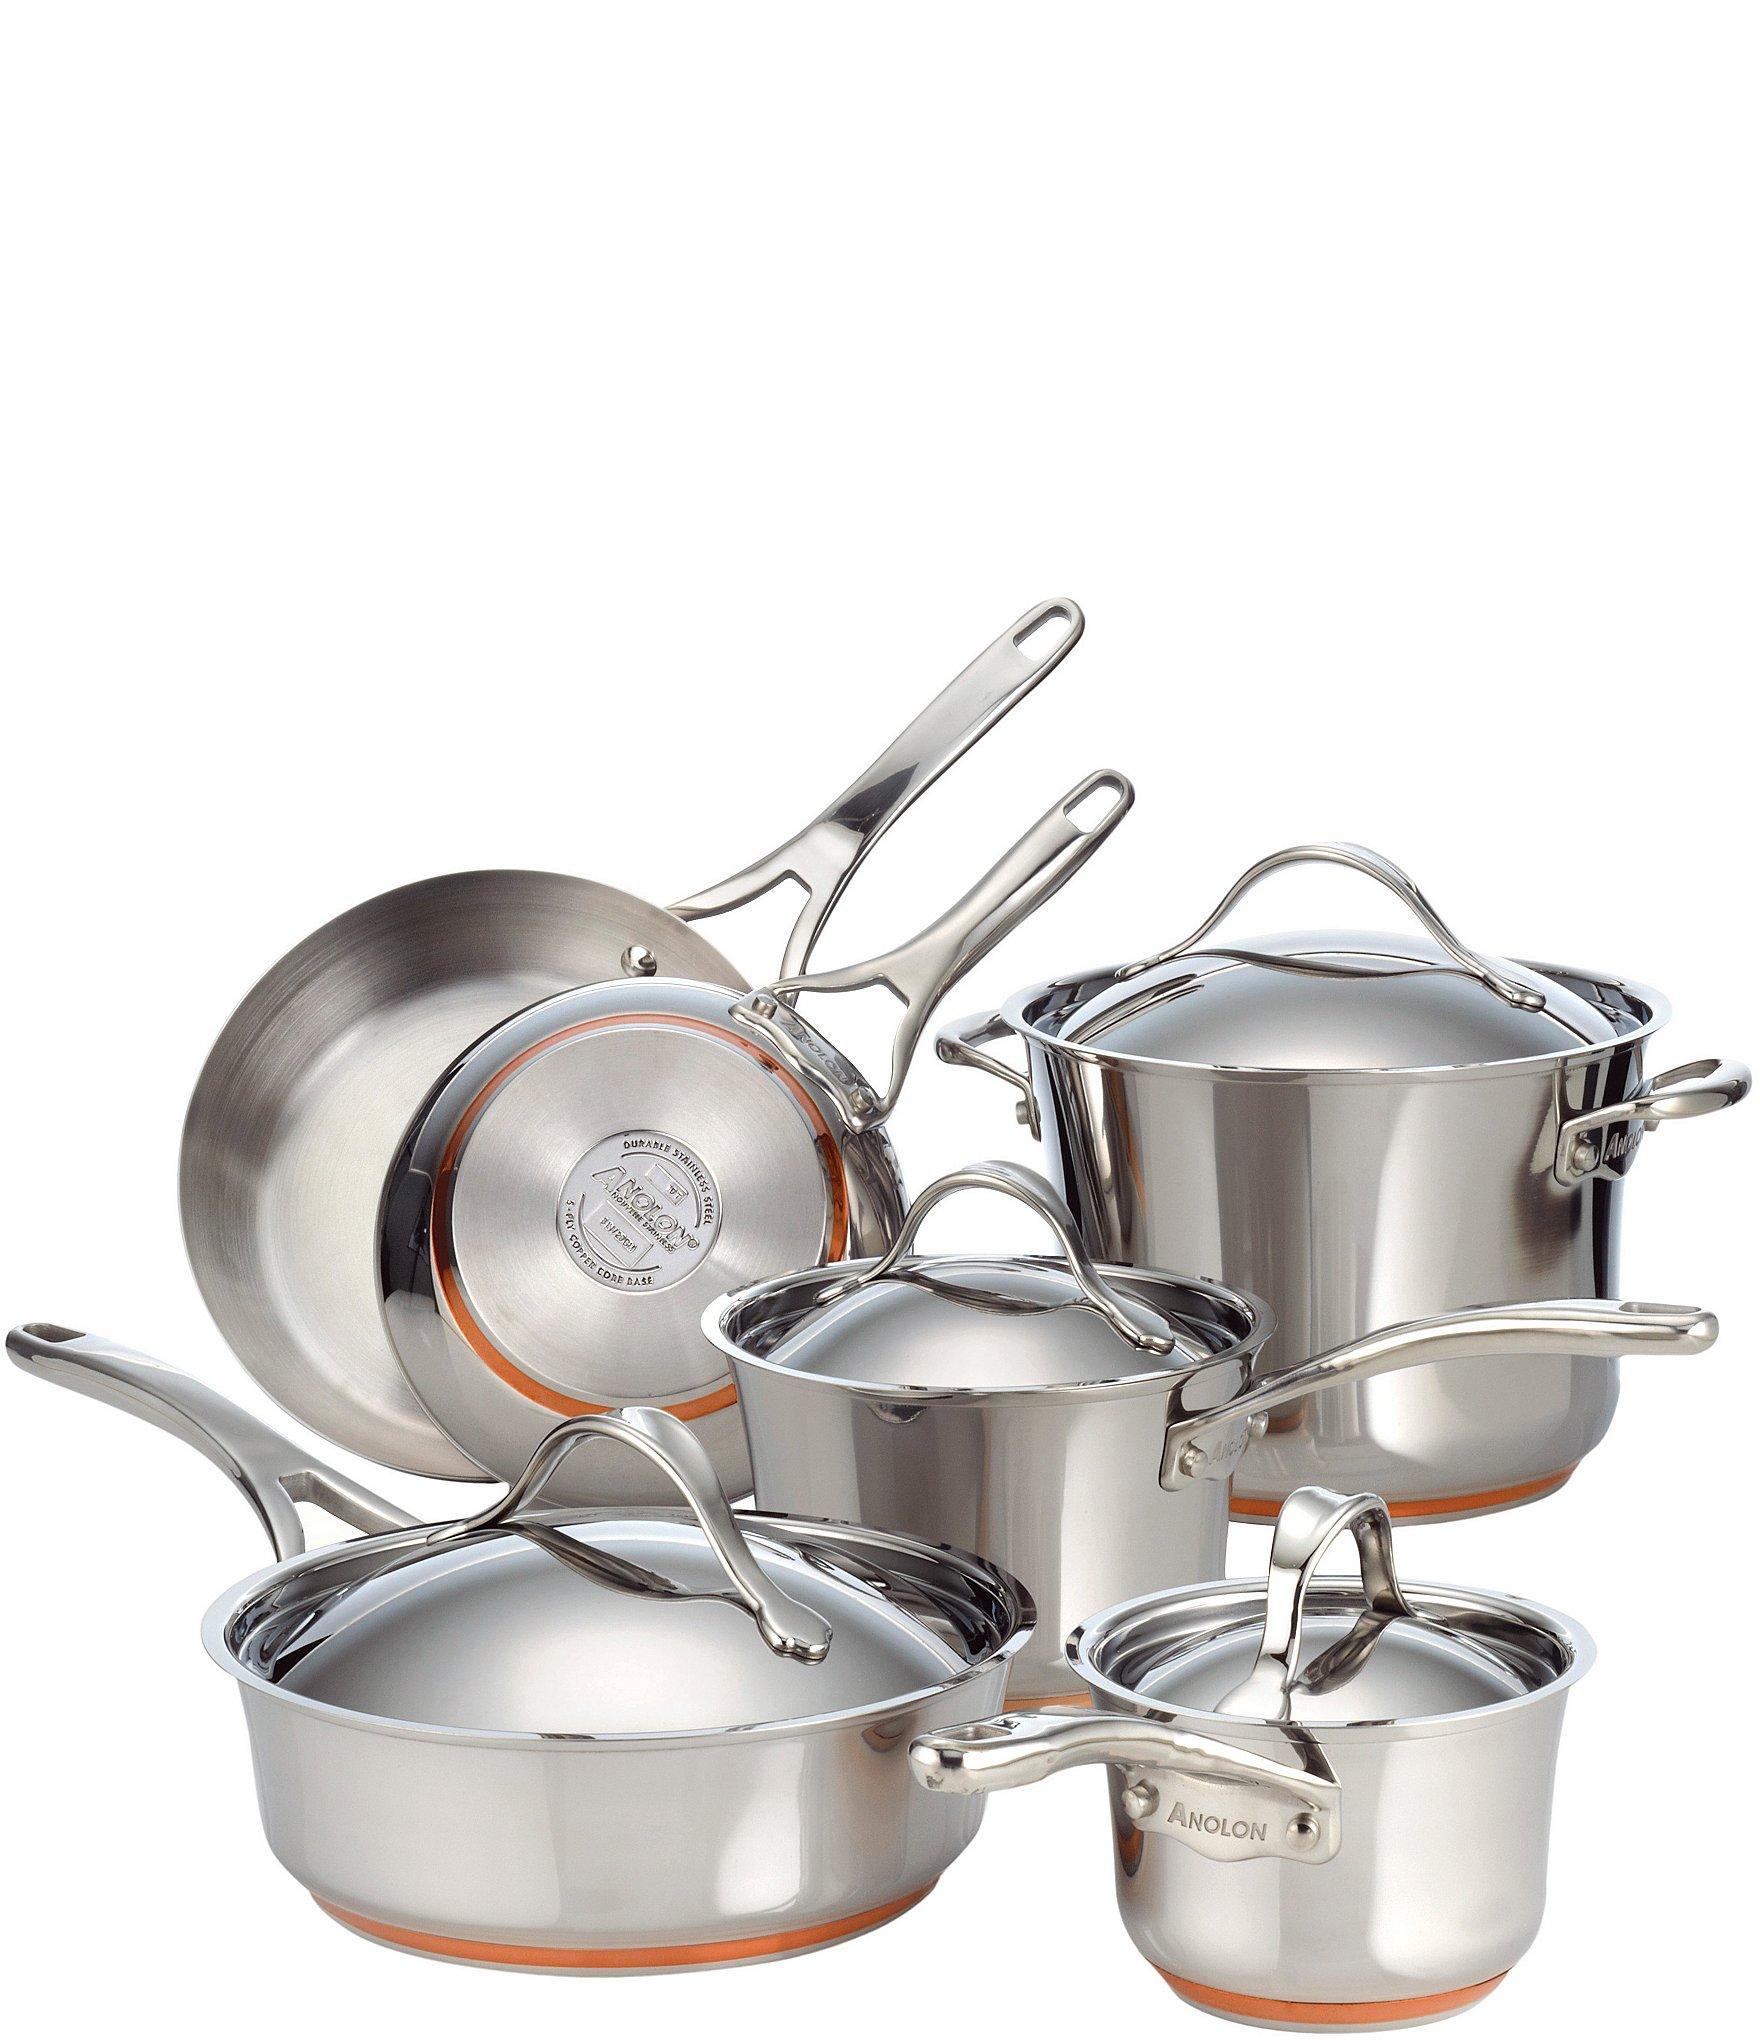 Anolon Nouvelle Copper Stainless Steel 10 Piece Cookware Set Dillard S